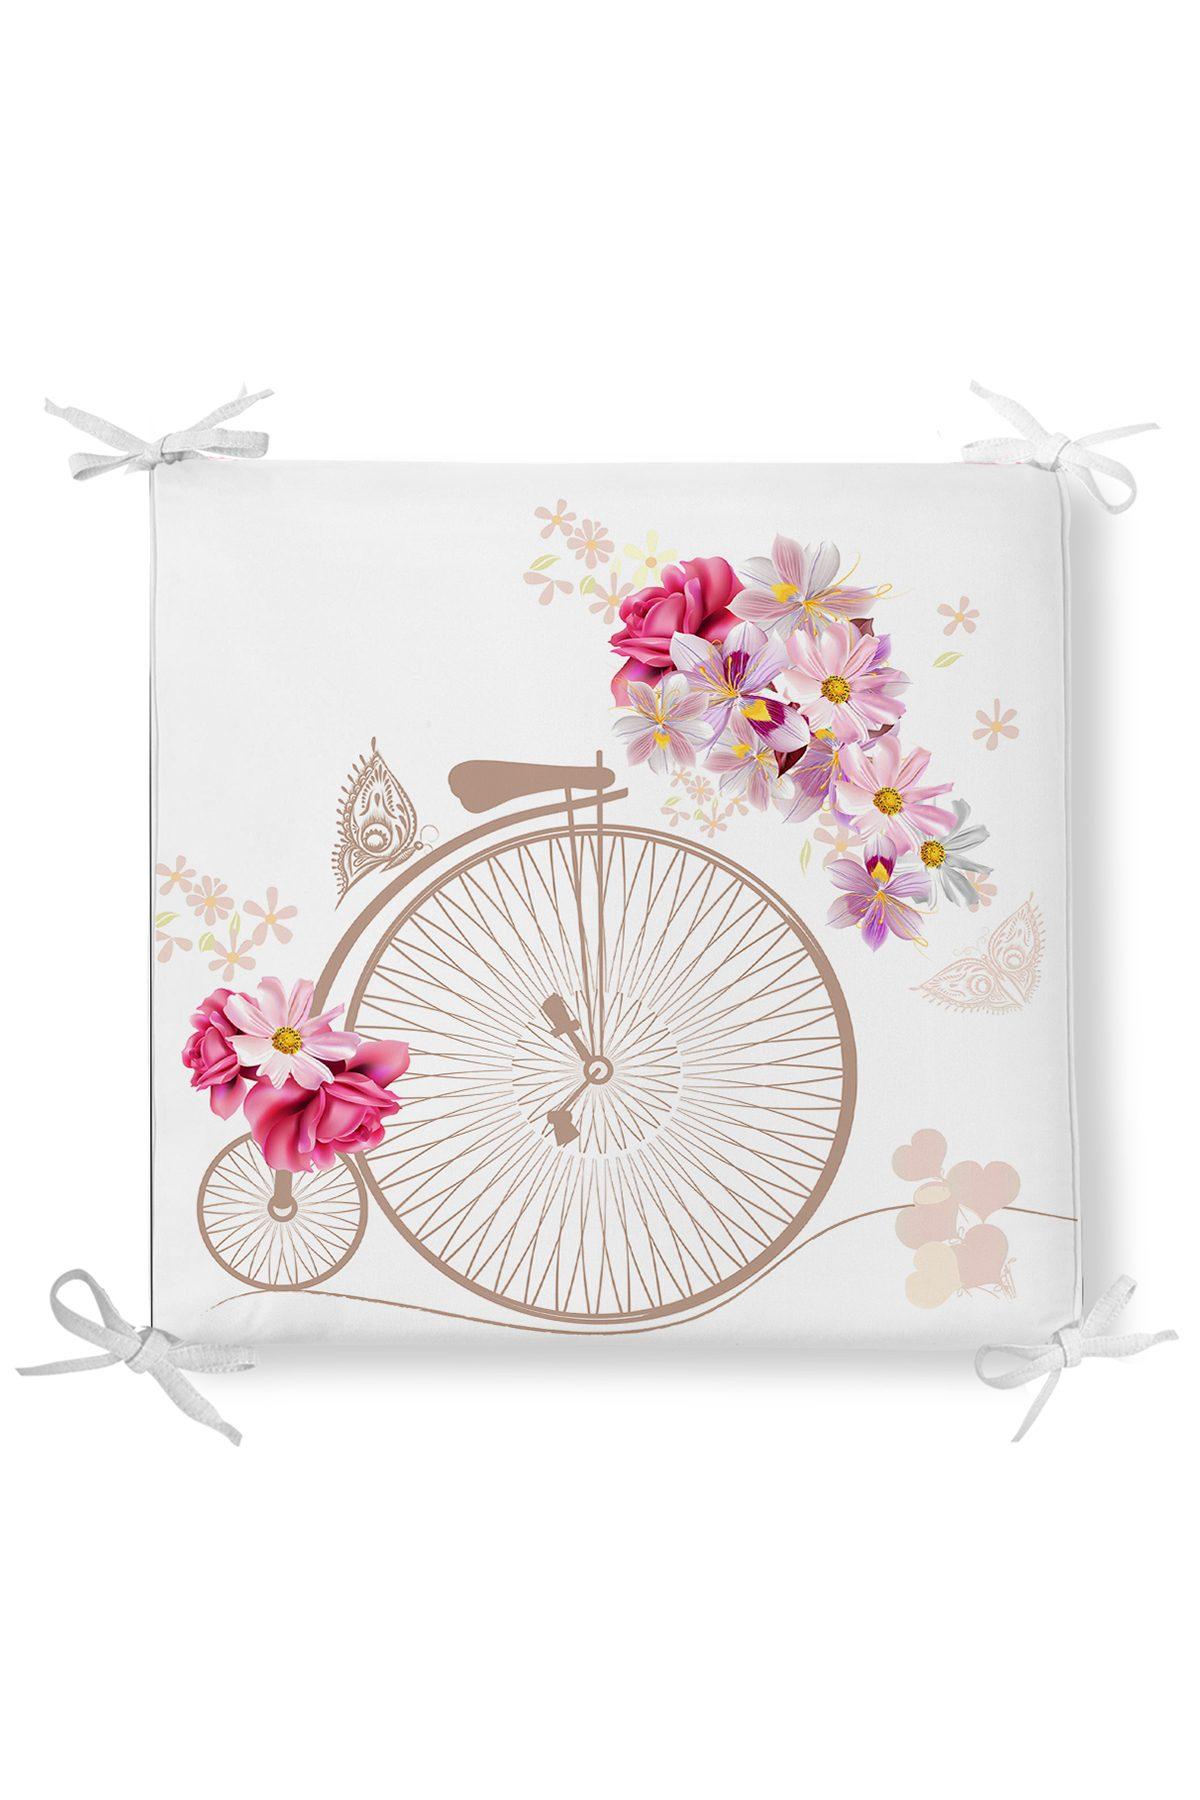 Bisiklet Desenli Dekorati Kare Sandalye Minderi Realhomes